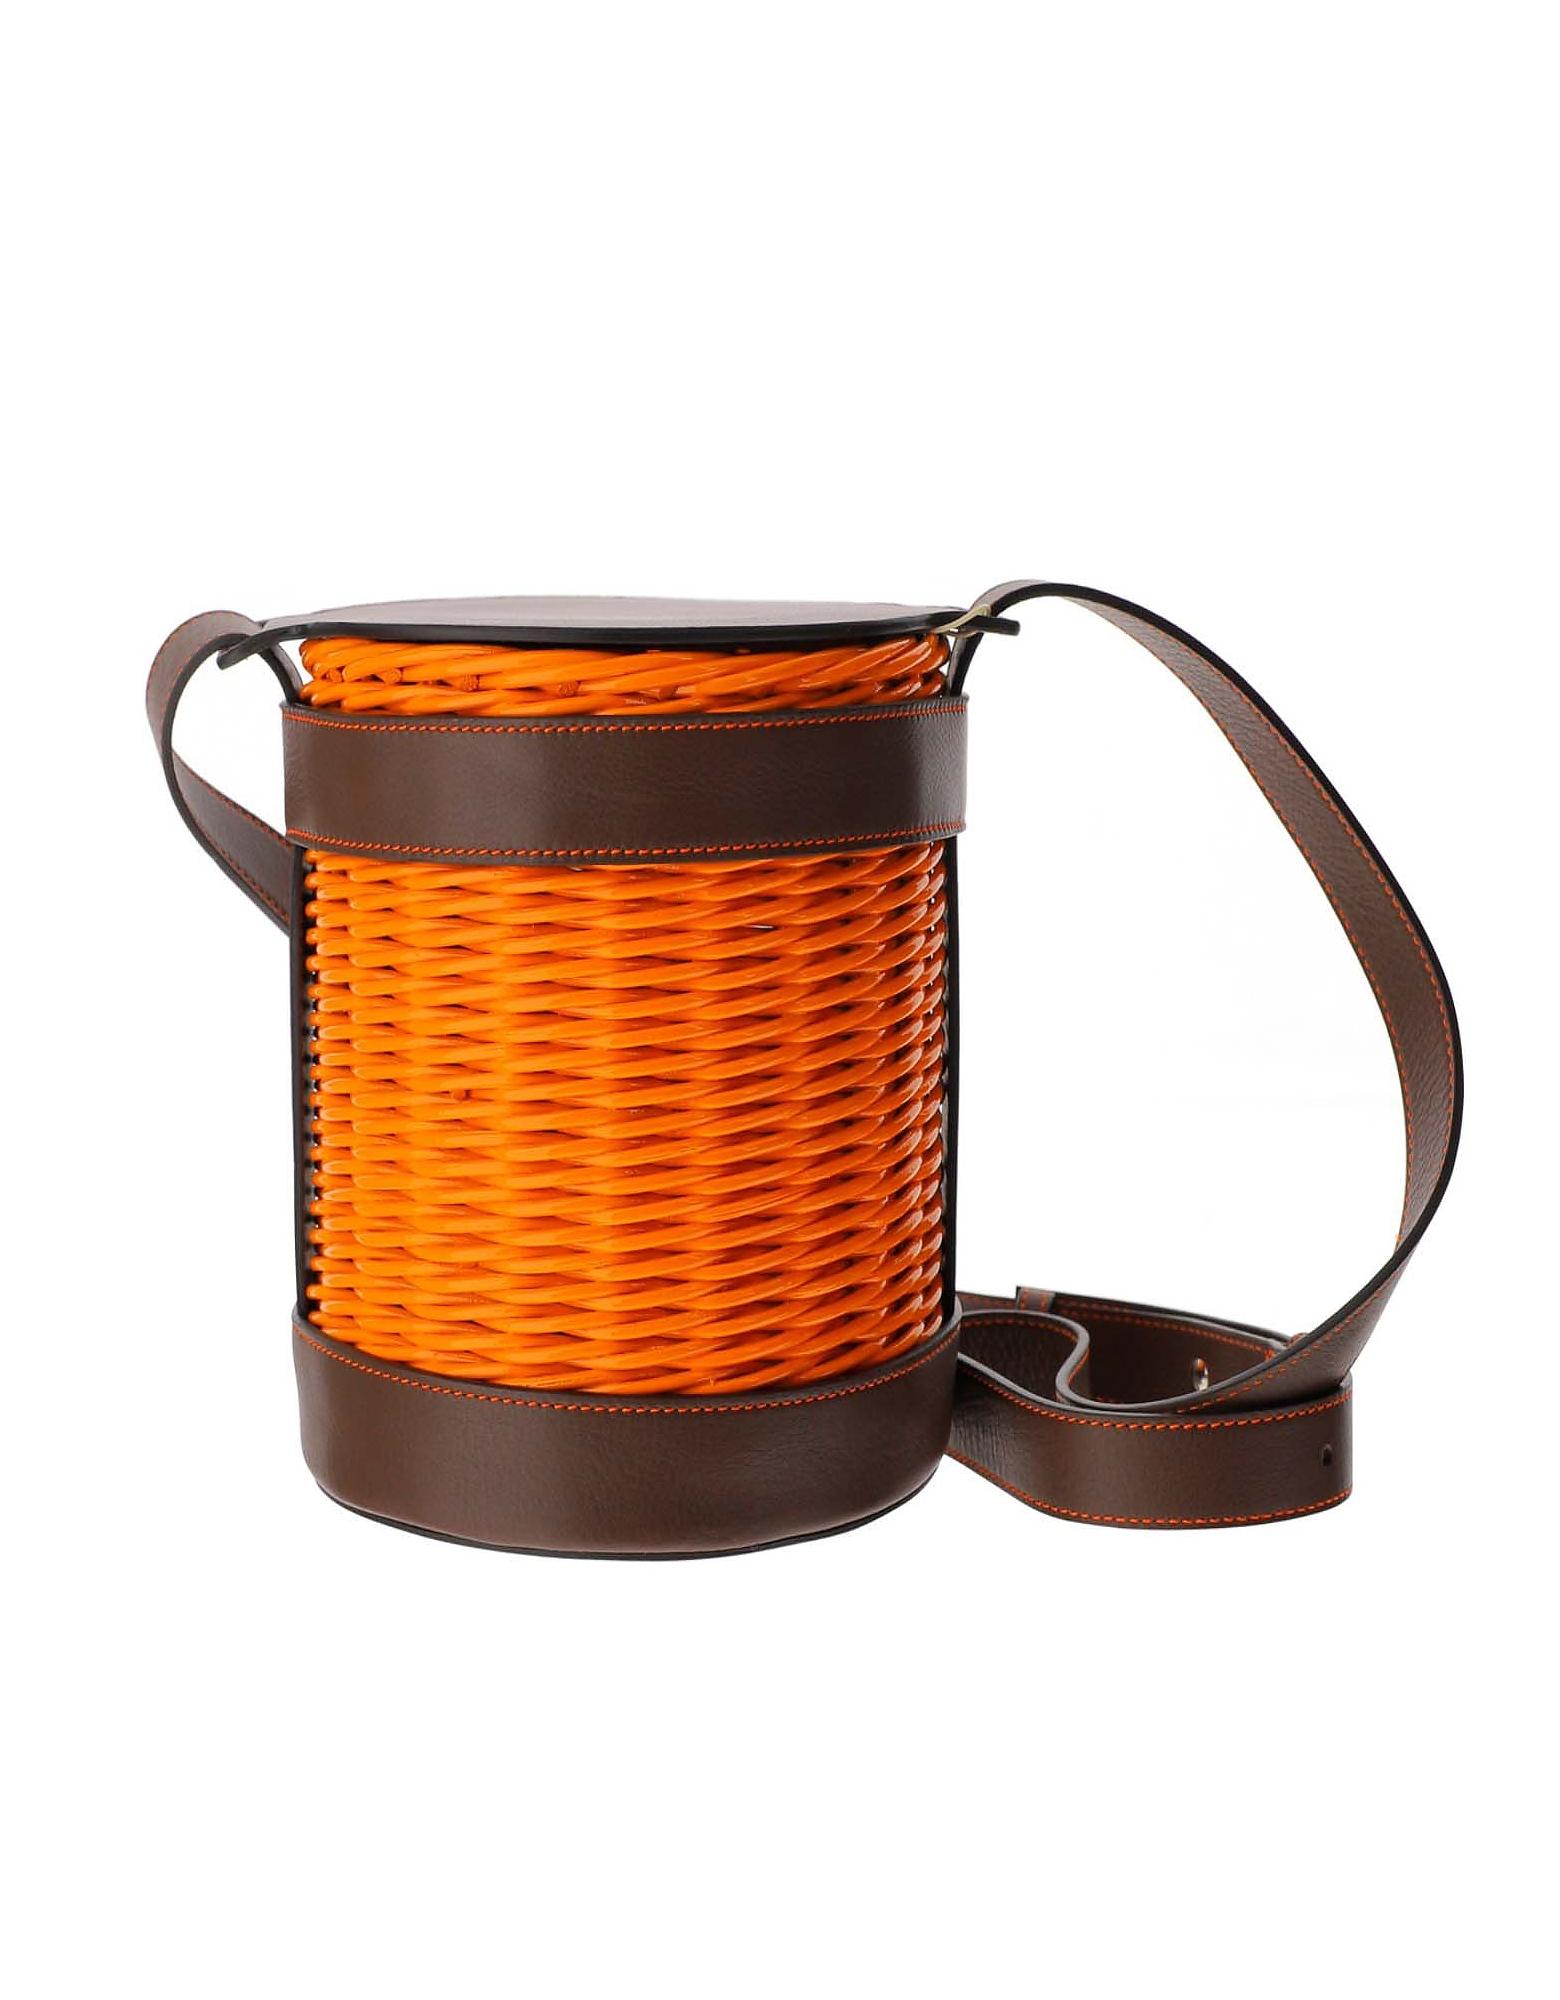 Gatti Designer Handbags, Pumpink WOven Straw and Leather Shoulder Bag